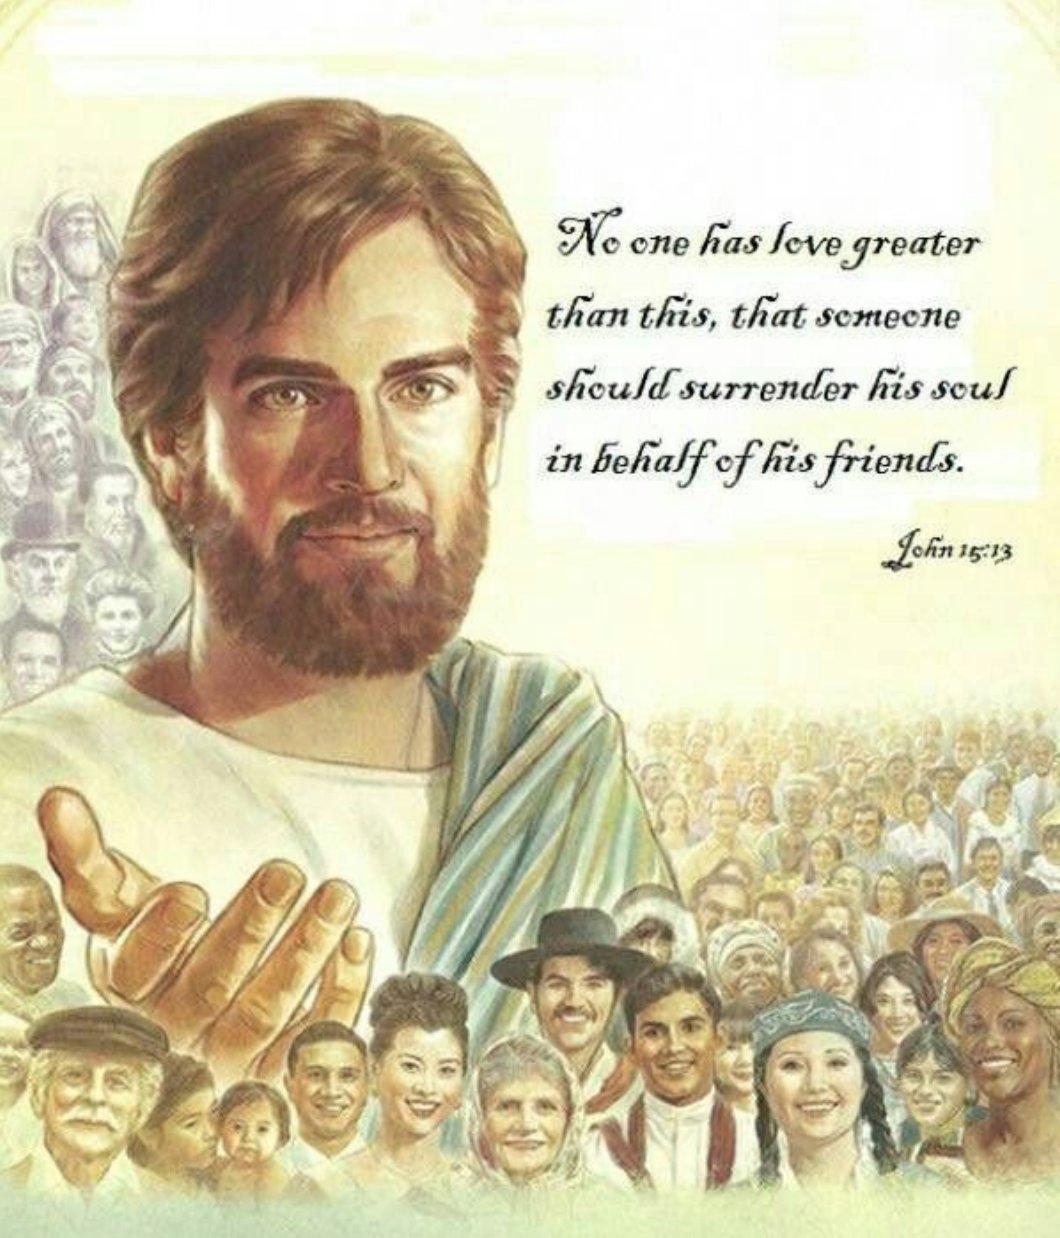 screen shot 2017 11 29 at 13 56 40.png?resize=1200,630 - エホバの証人に芸能人が少ないのはなぜなのか